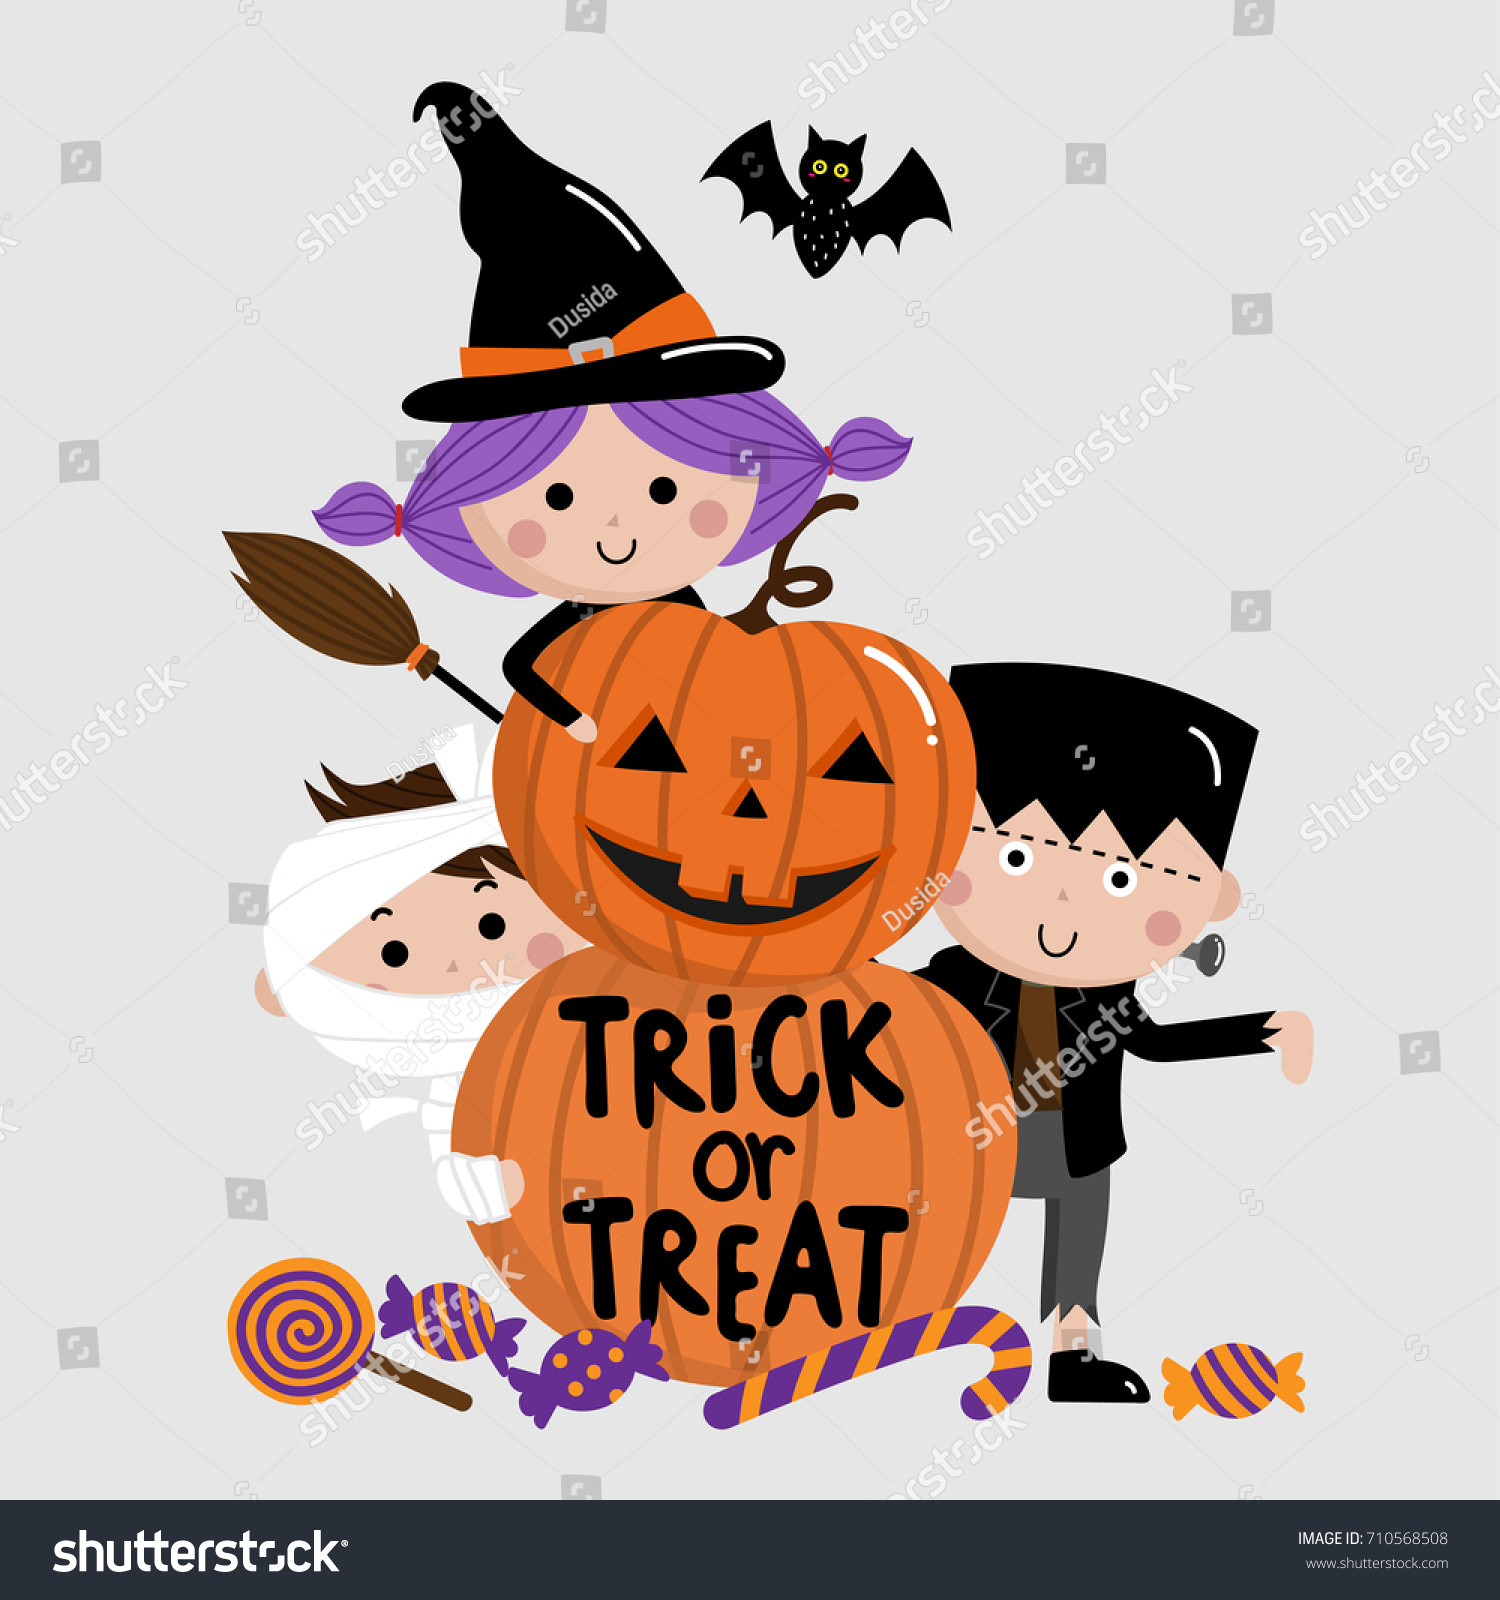 Halloween Trick Or Treat Clipart.Halloween Trick Treat Kids Pumpkin Vector Stock Vector Royalty Free 710568508